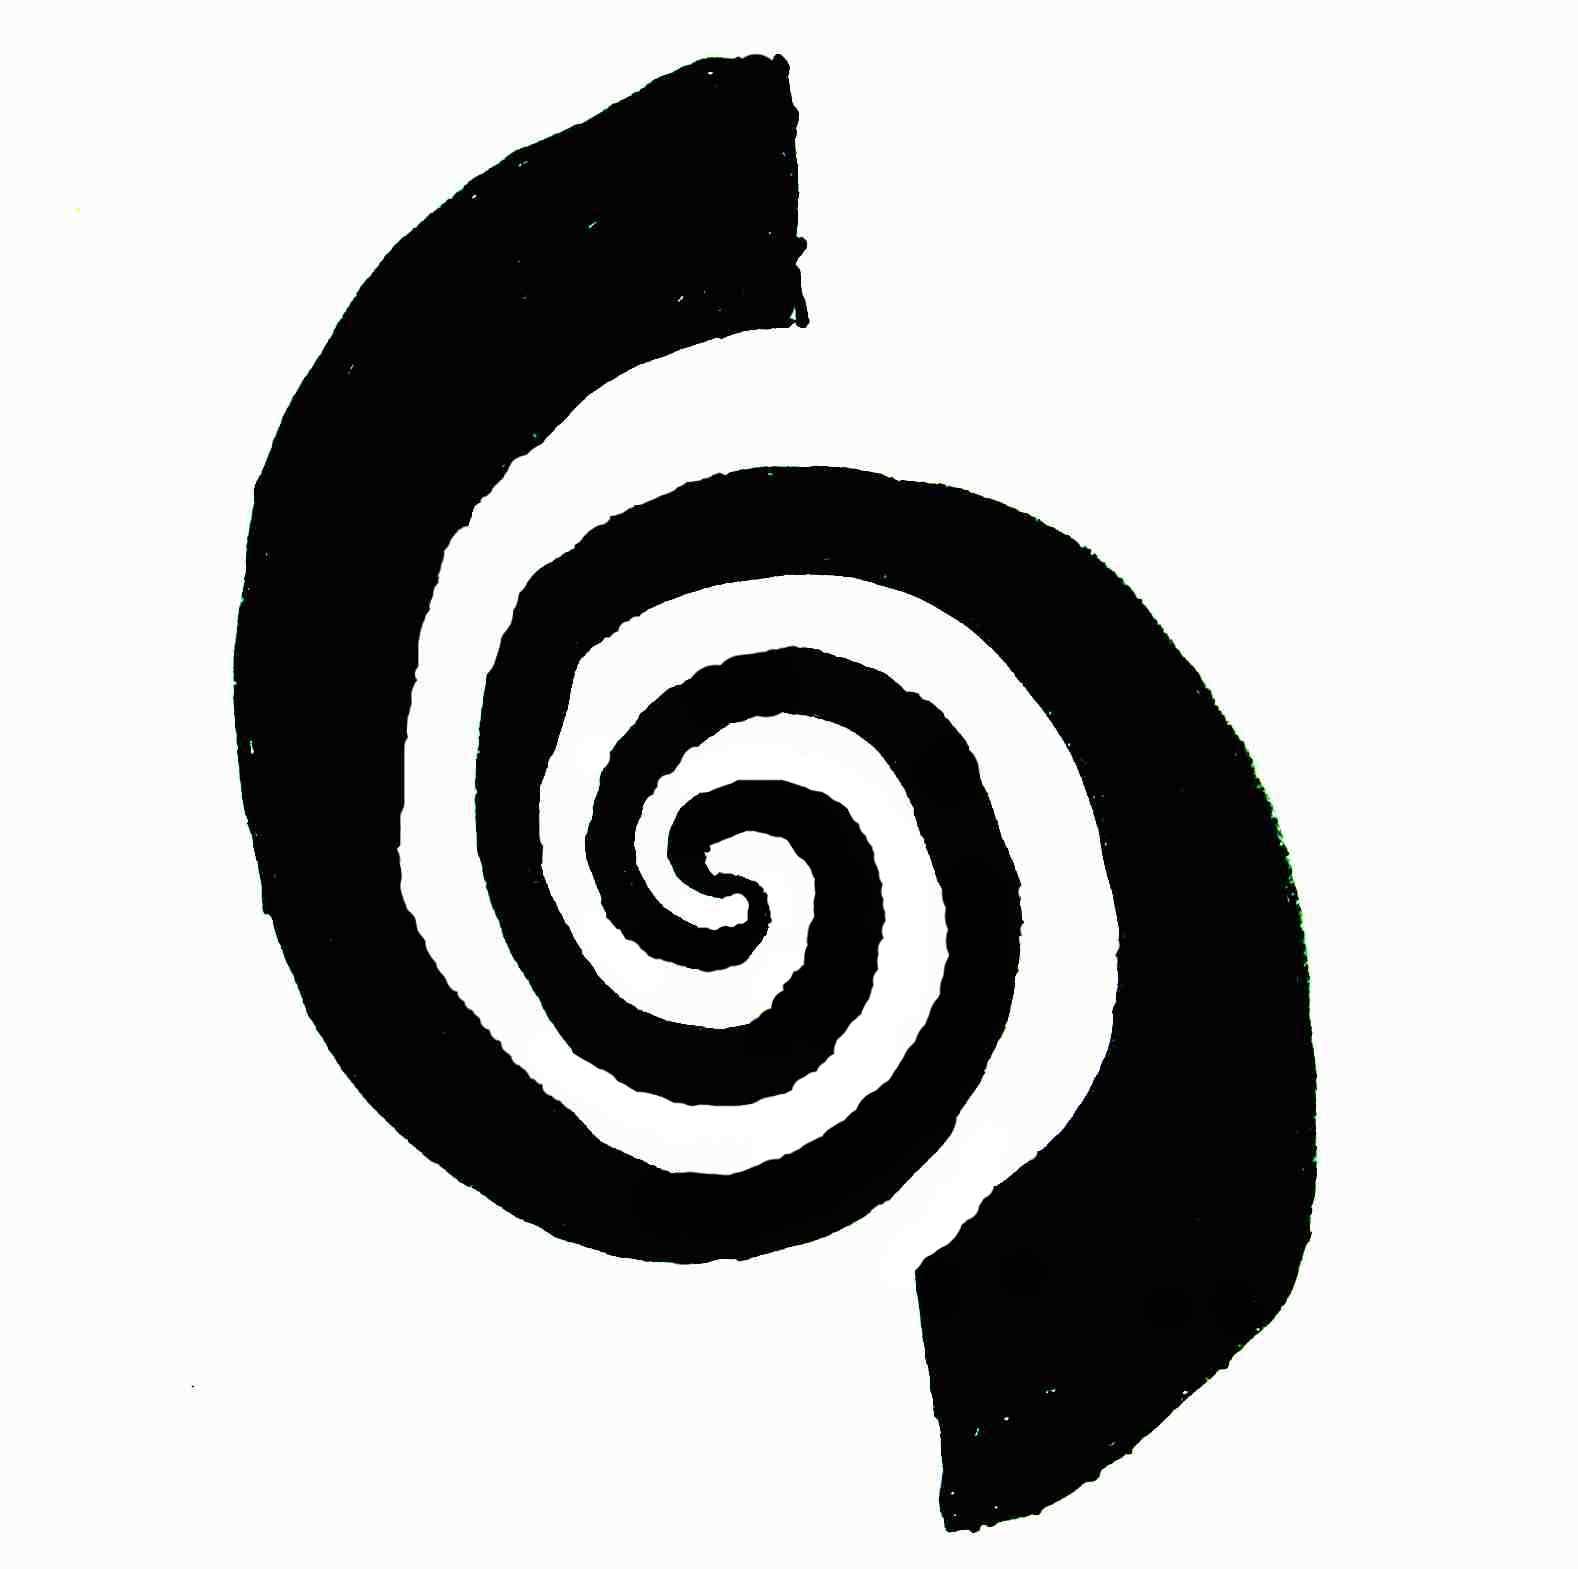 Spiral clipart google Encyclopedia logarithmic Free Spiral jpg